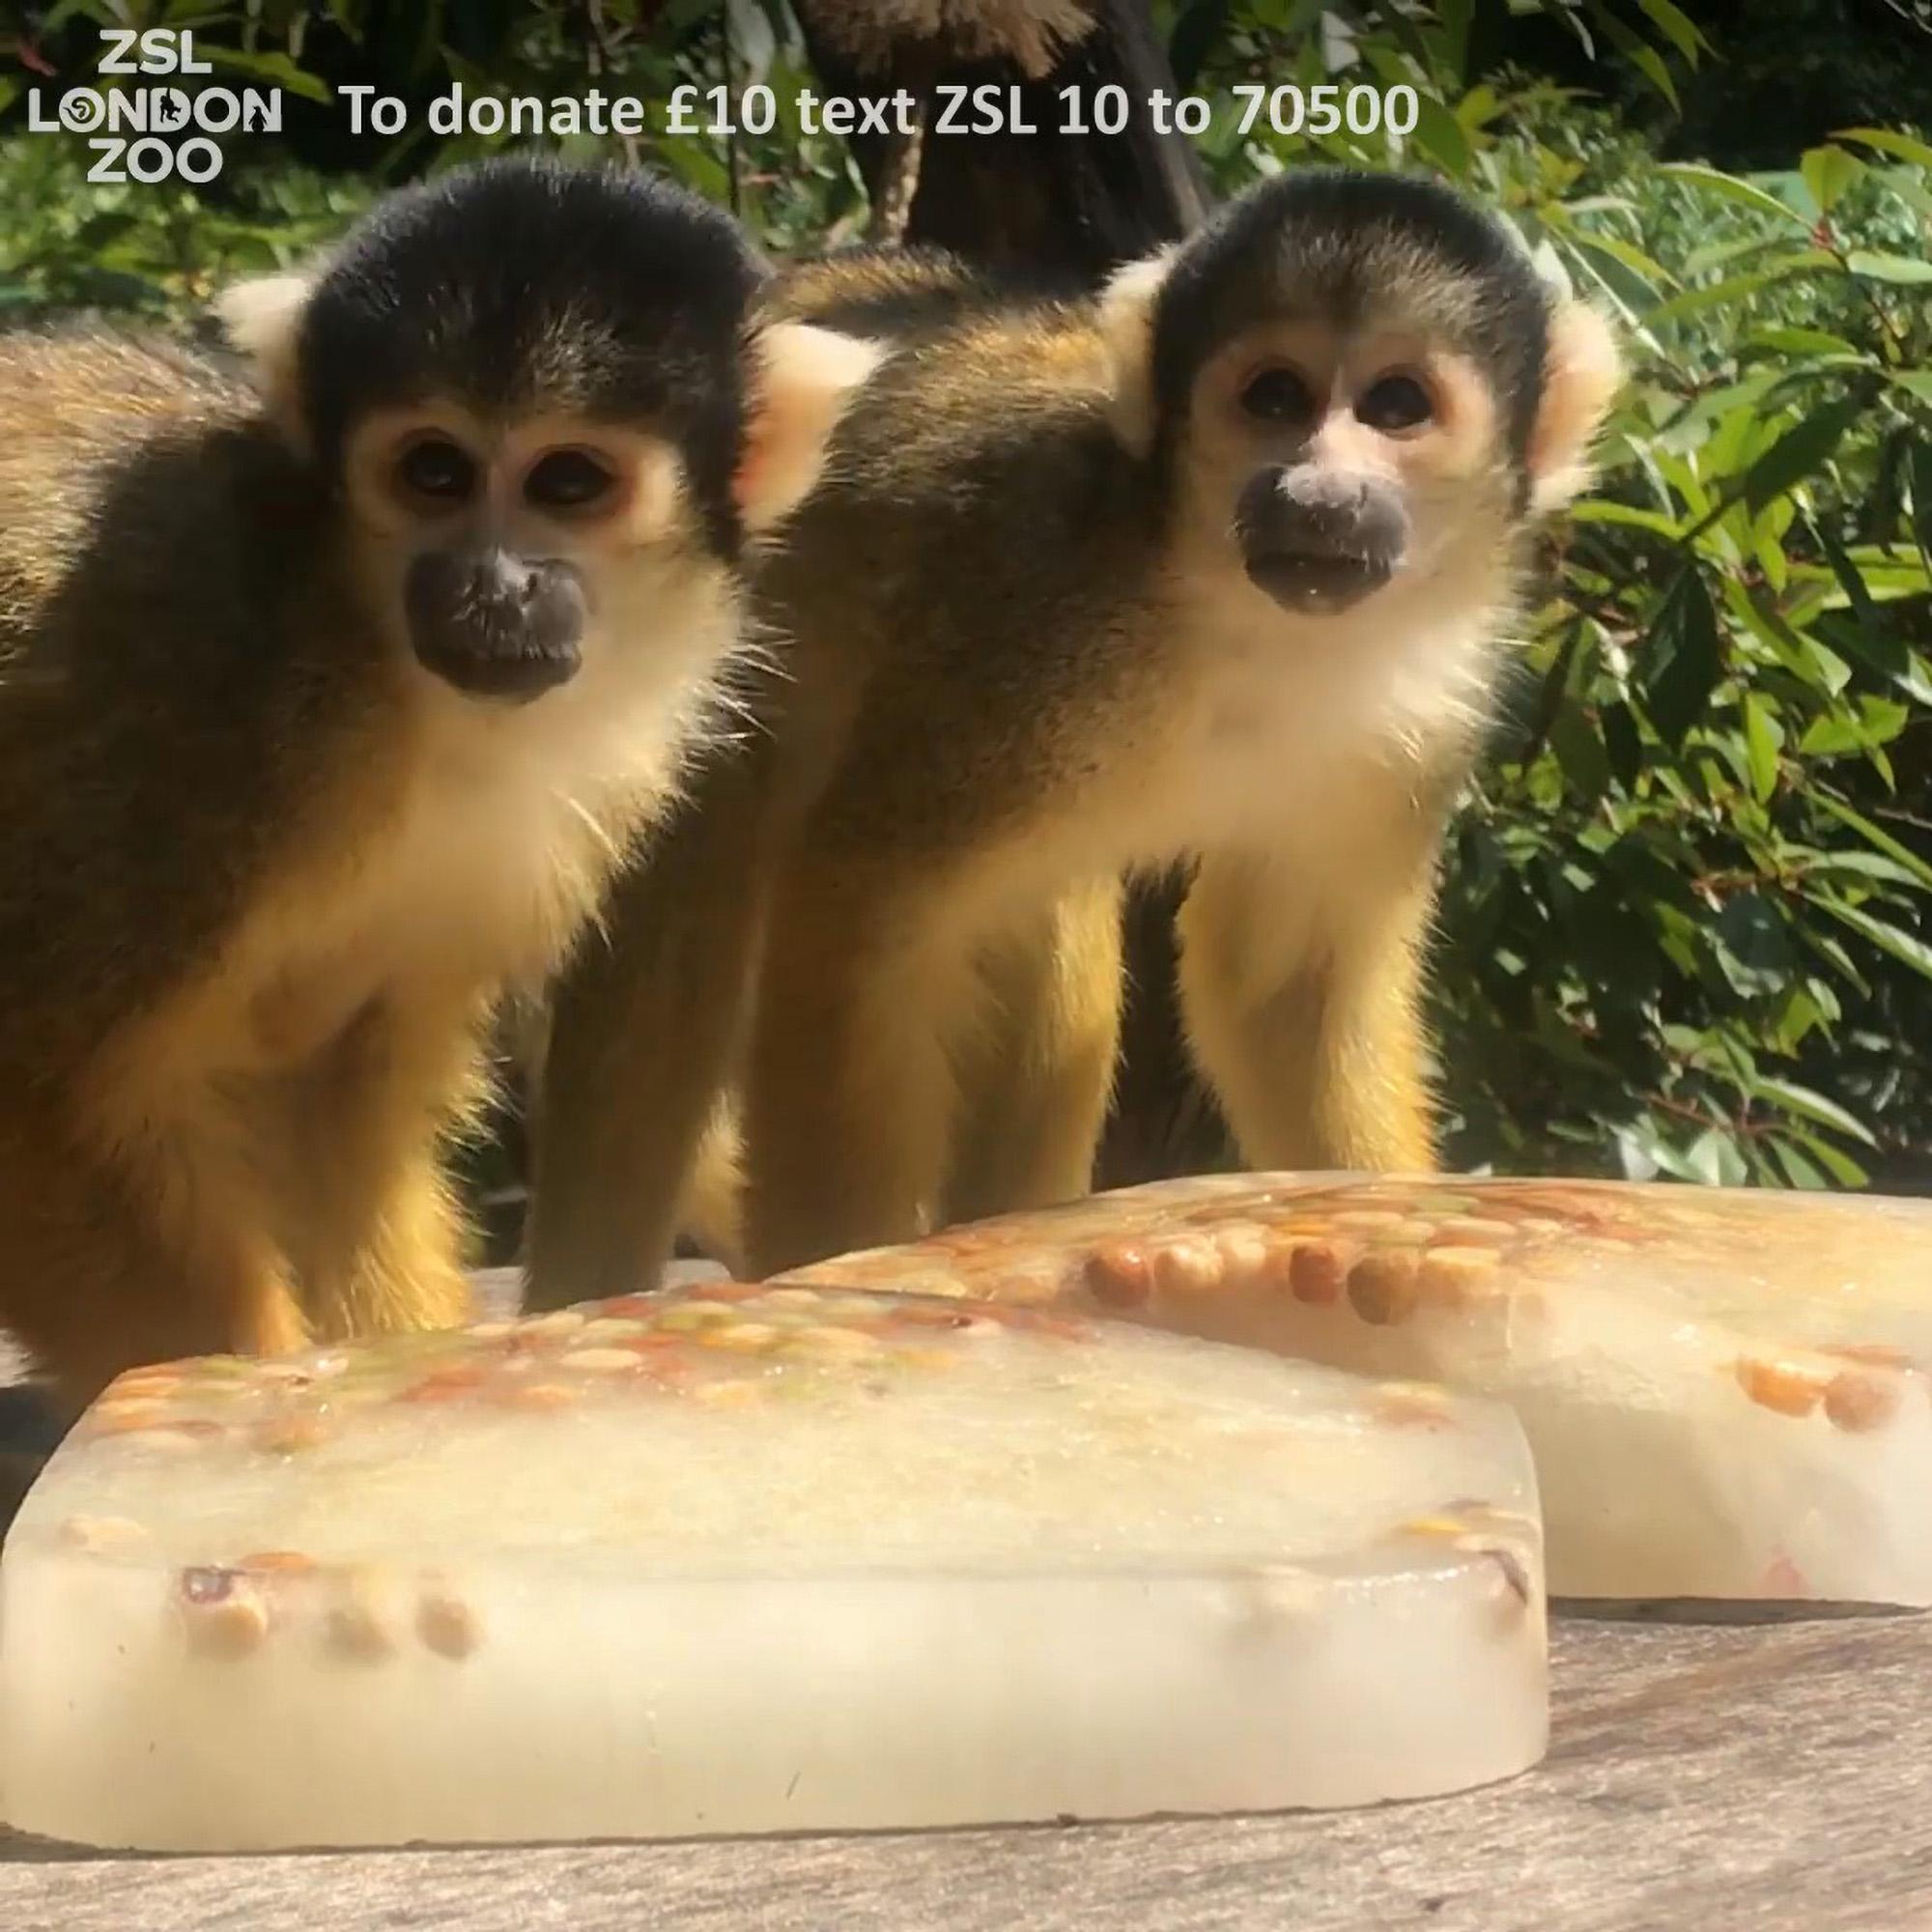 VIDEO: Monkey See Monkey Phew